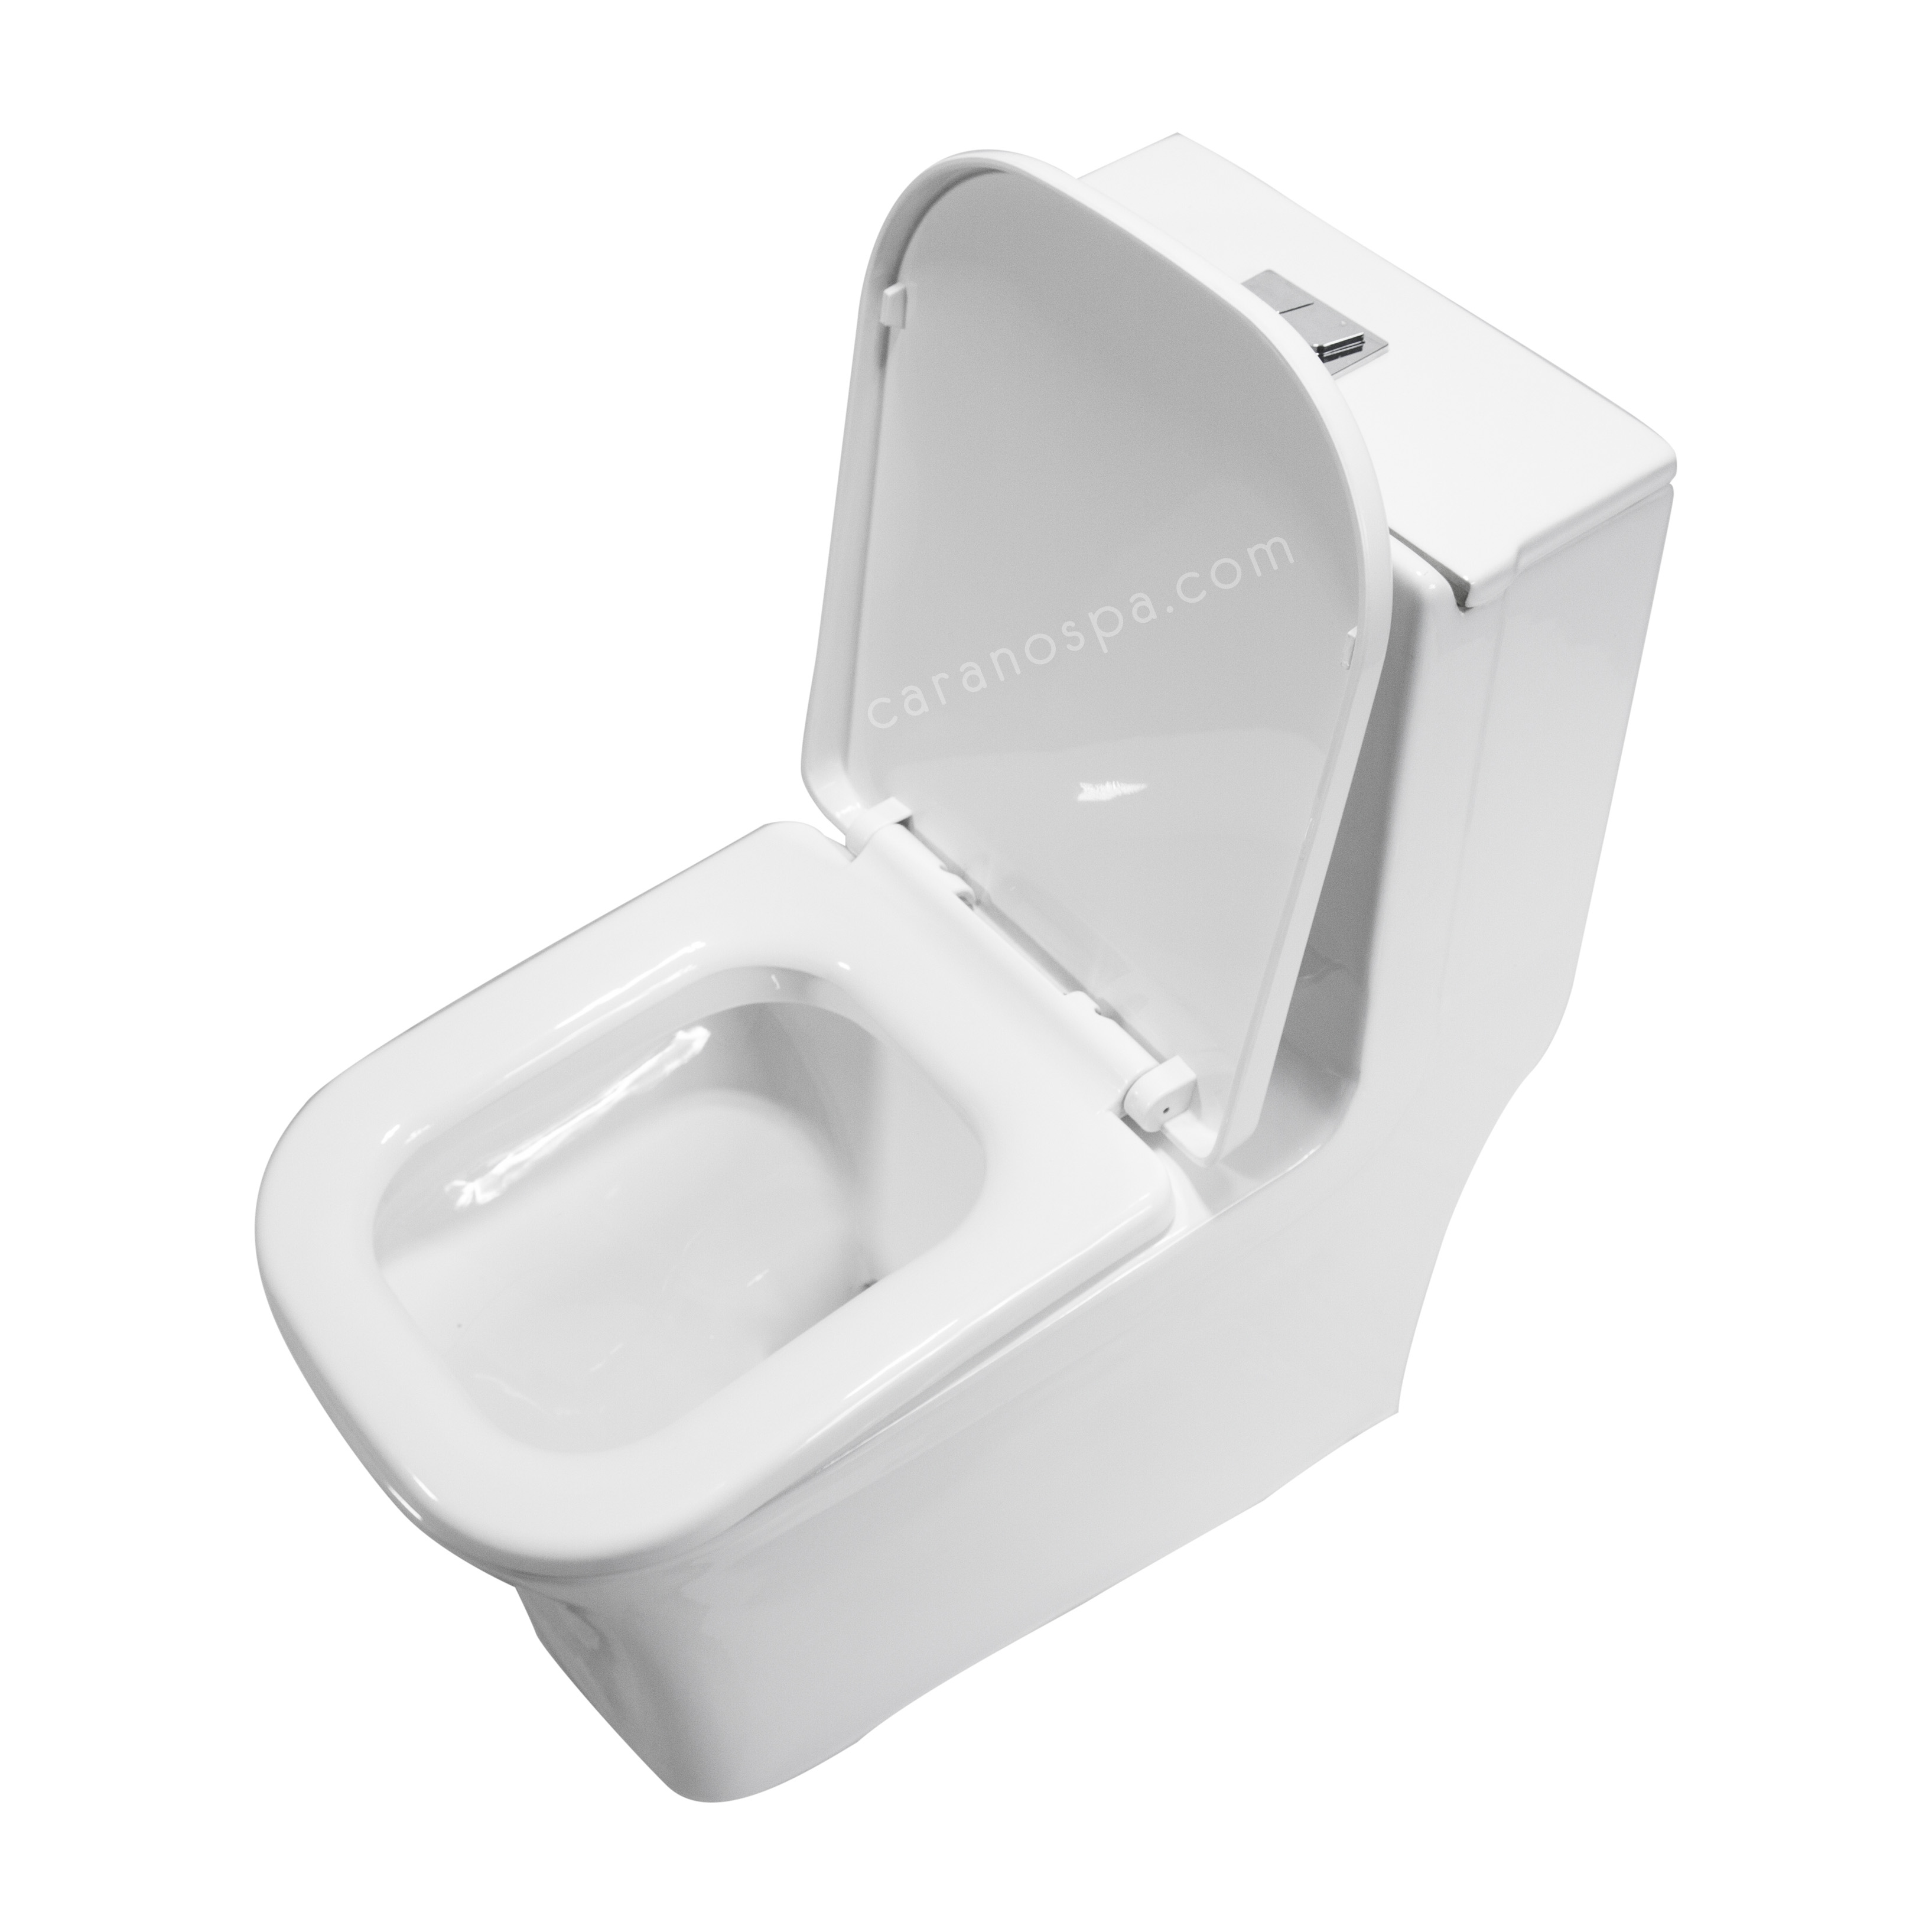 BỒN CẦU CARANO 1 KHỐI K10D1R (Toilet model: K10D1R)